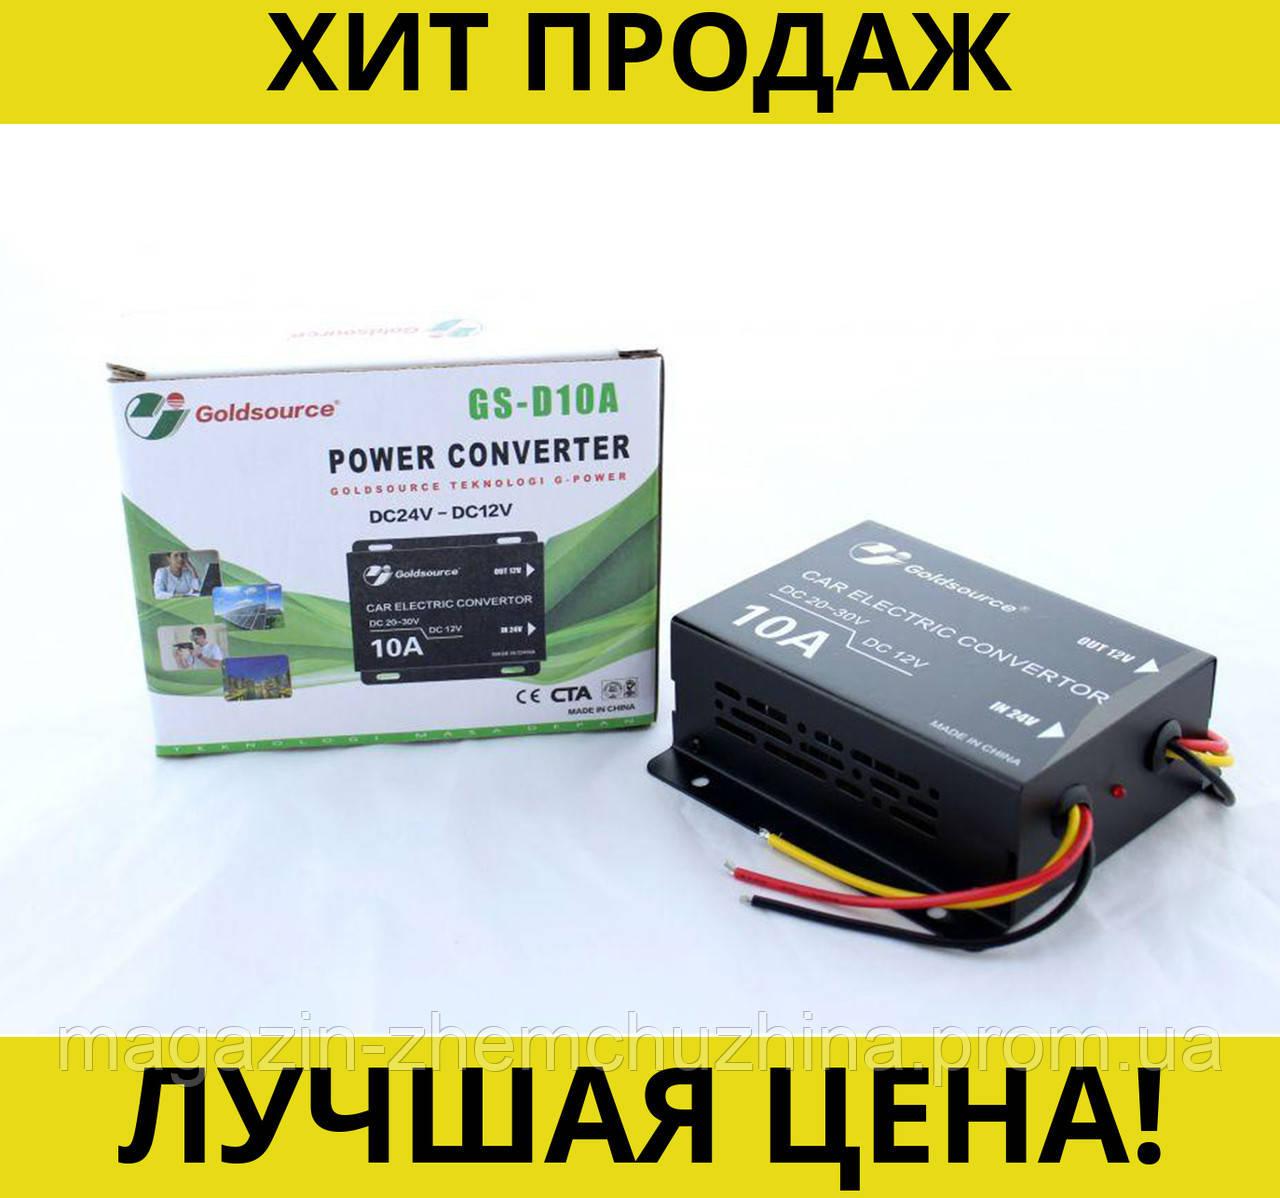 Sale! Преобразователь 24v-12v 10A- Новинка